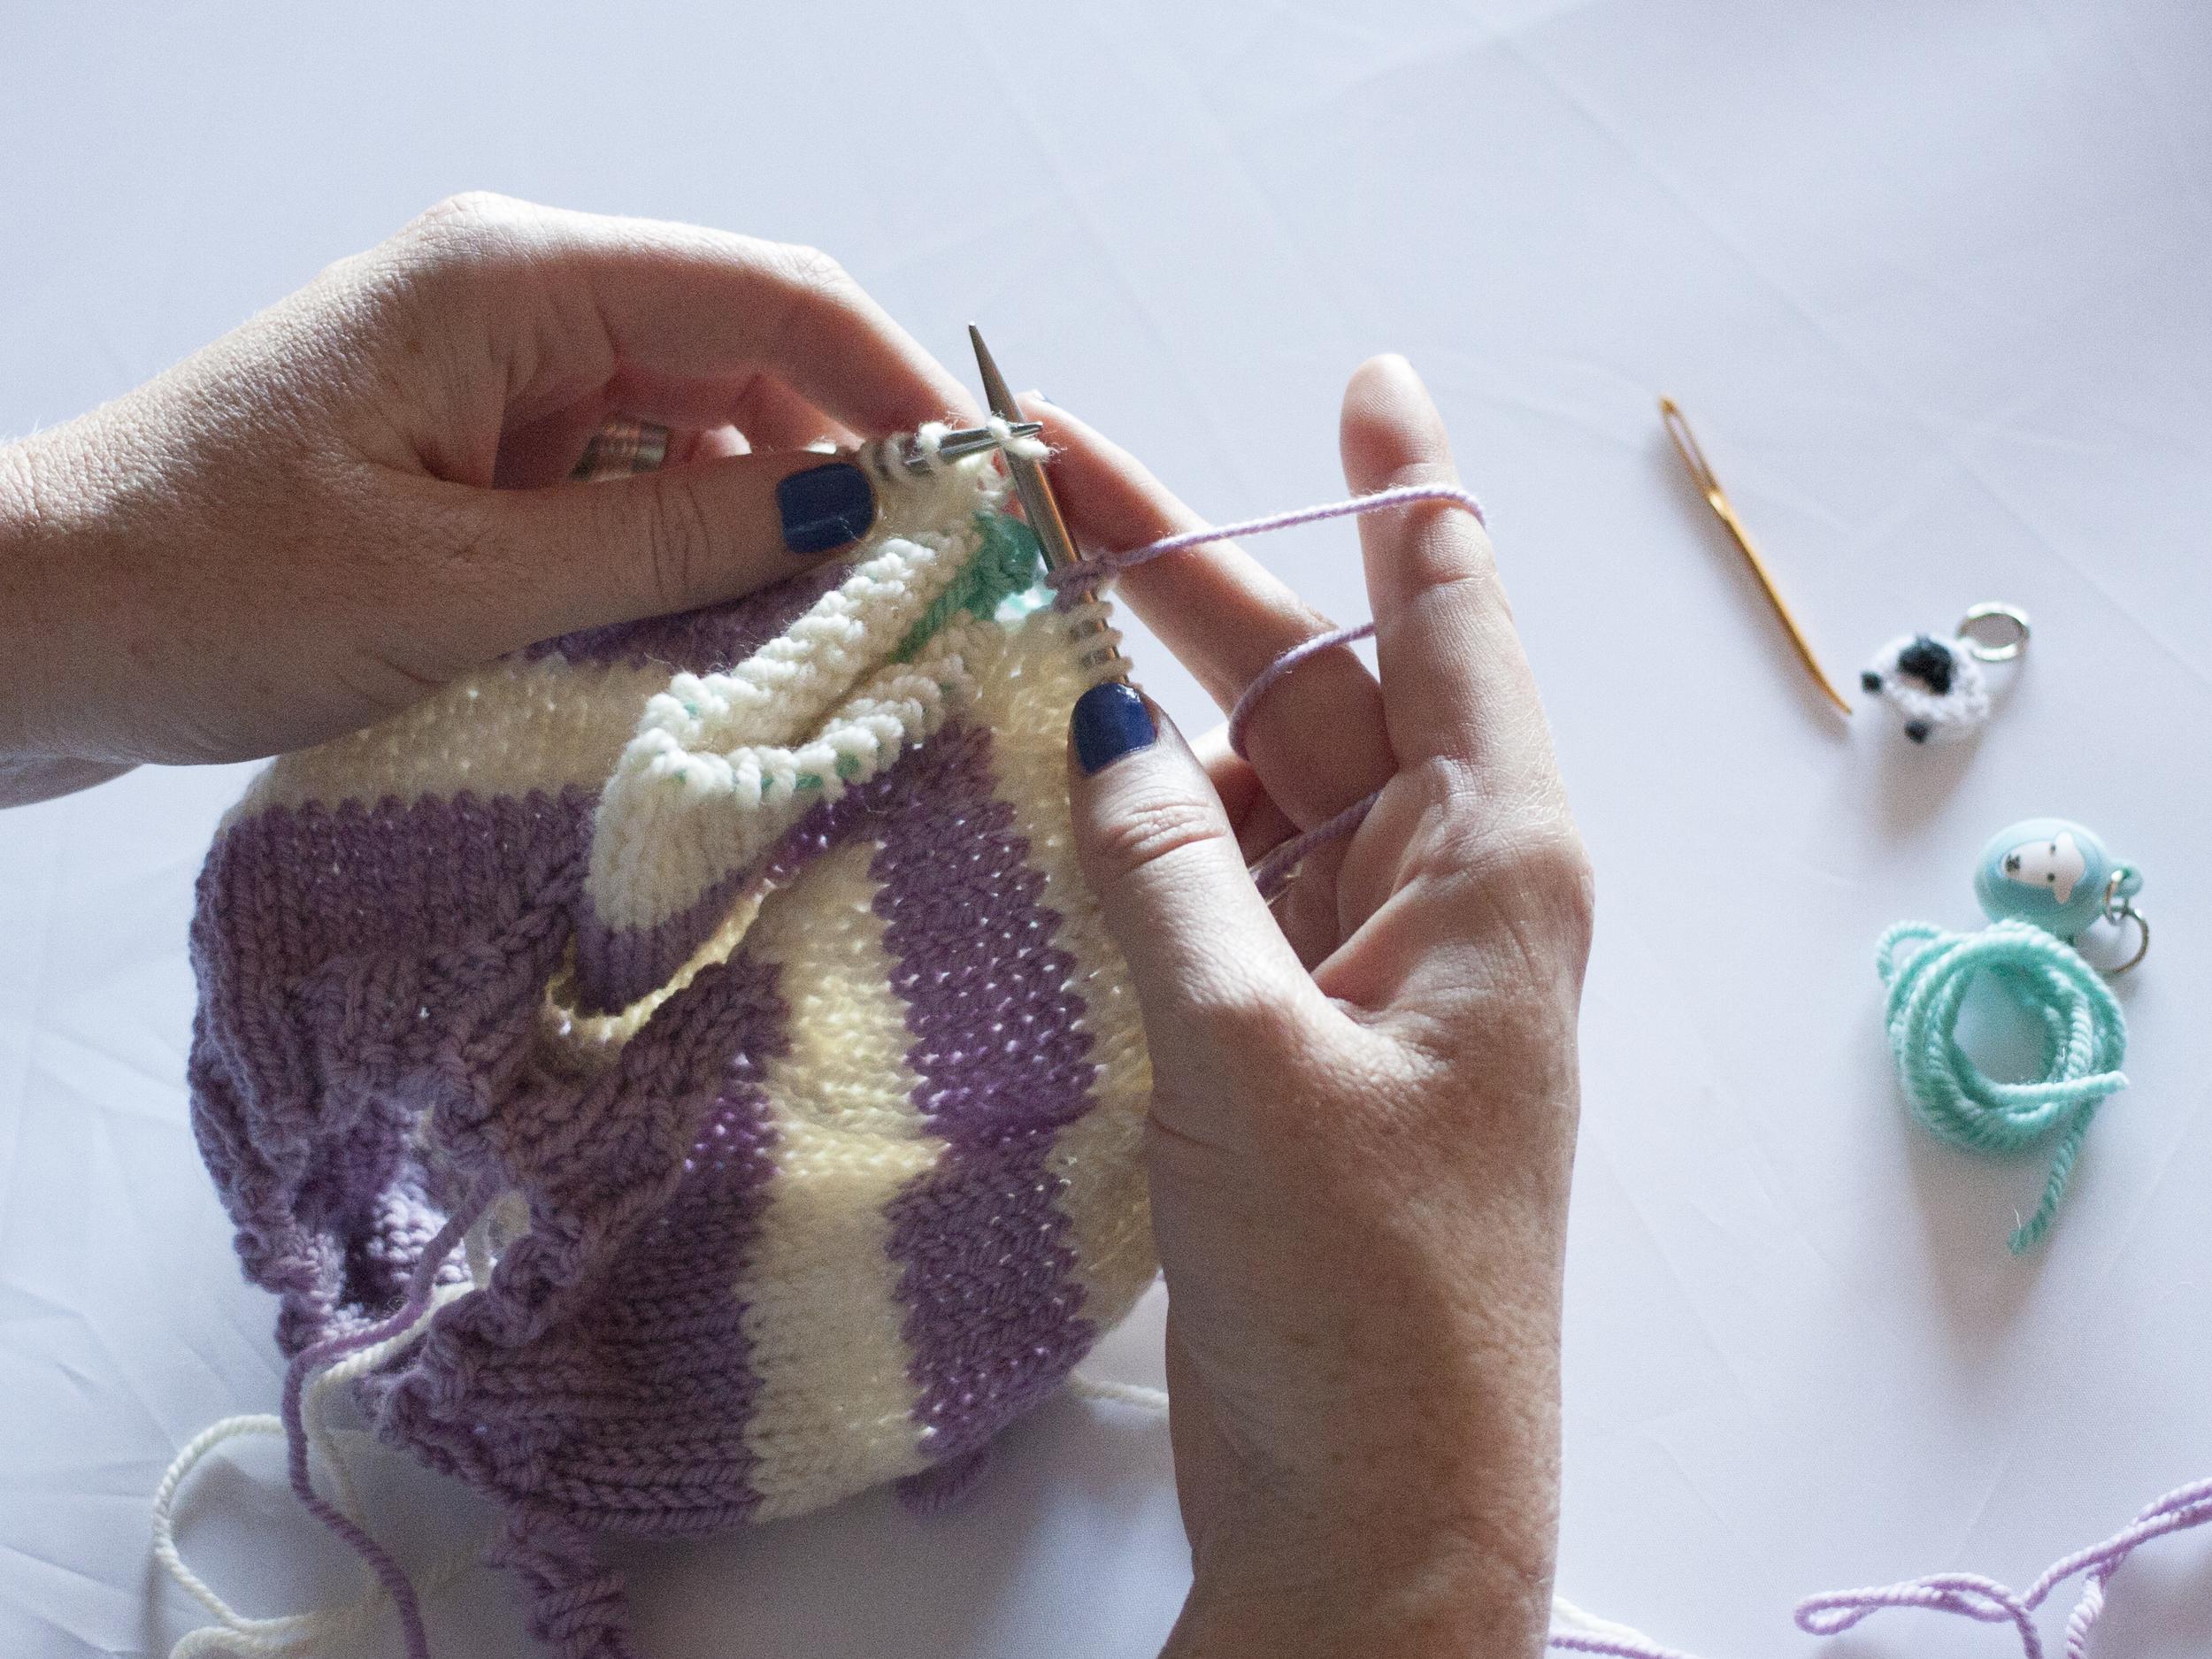 Knitting around the row